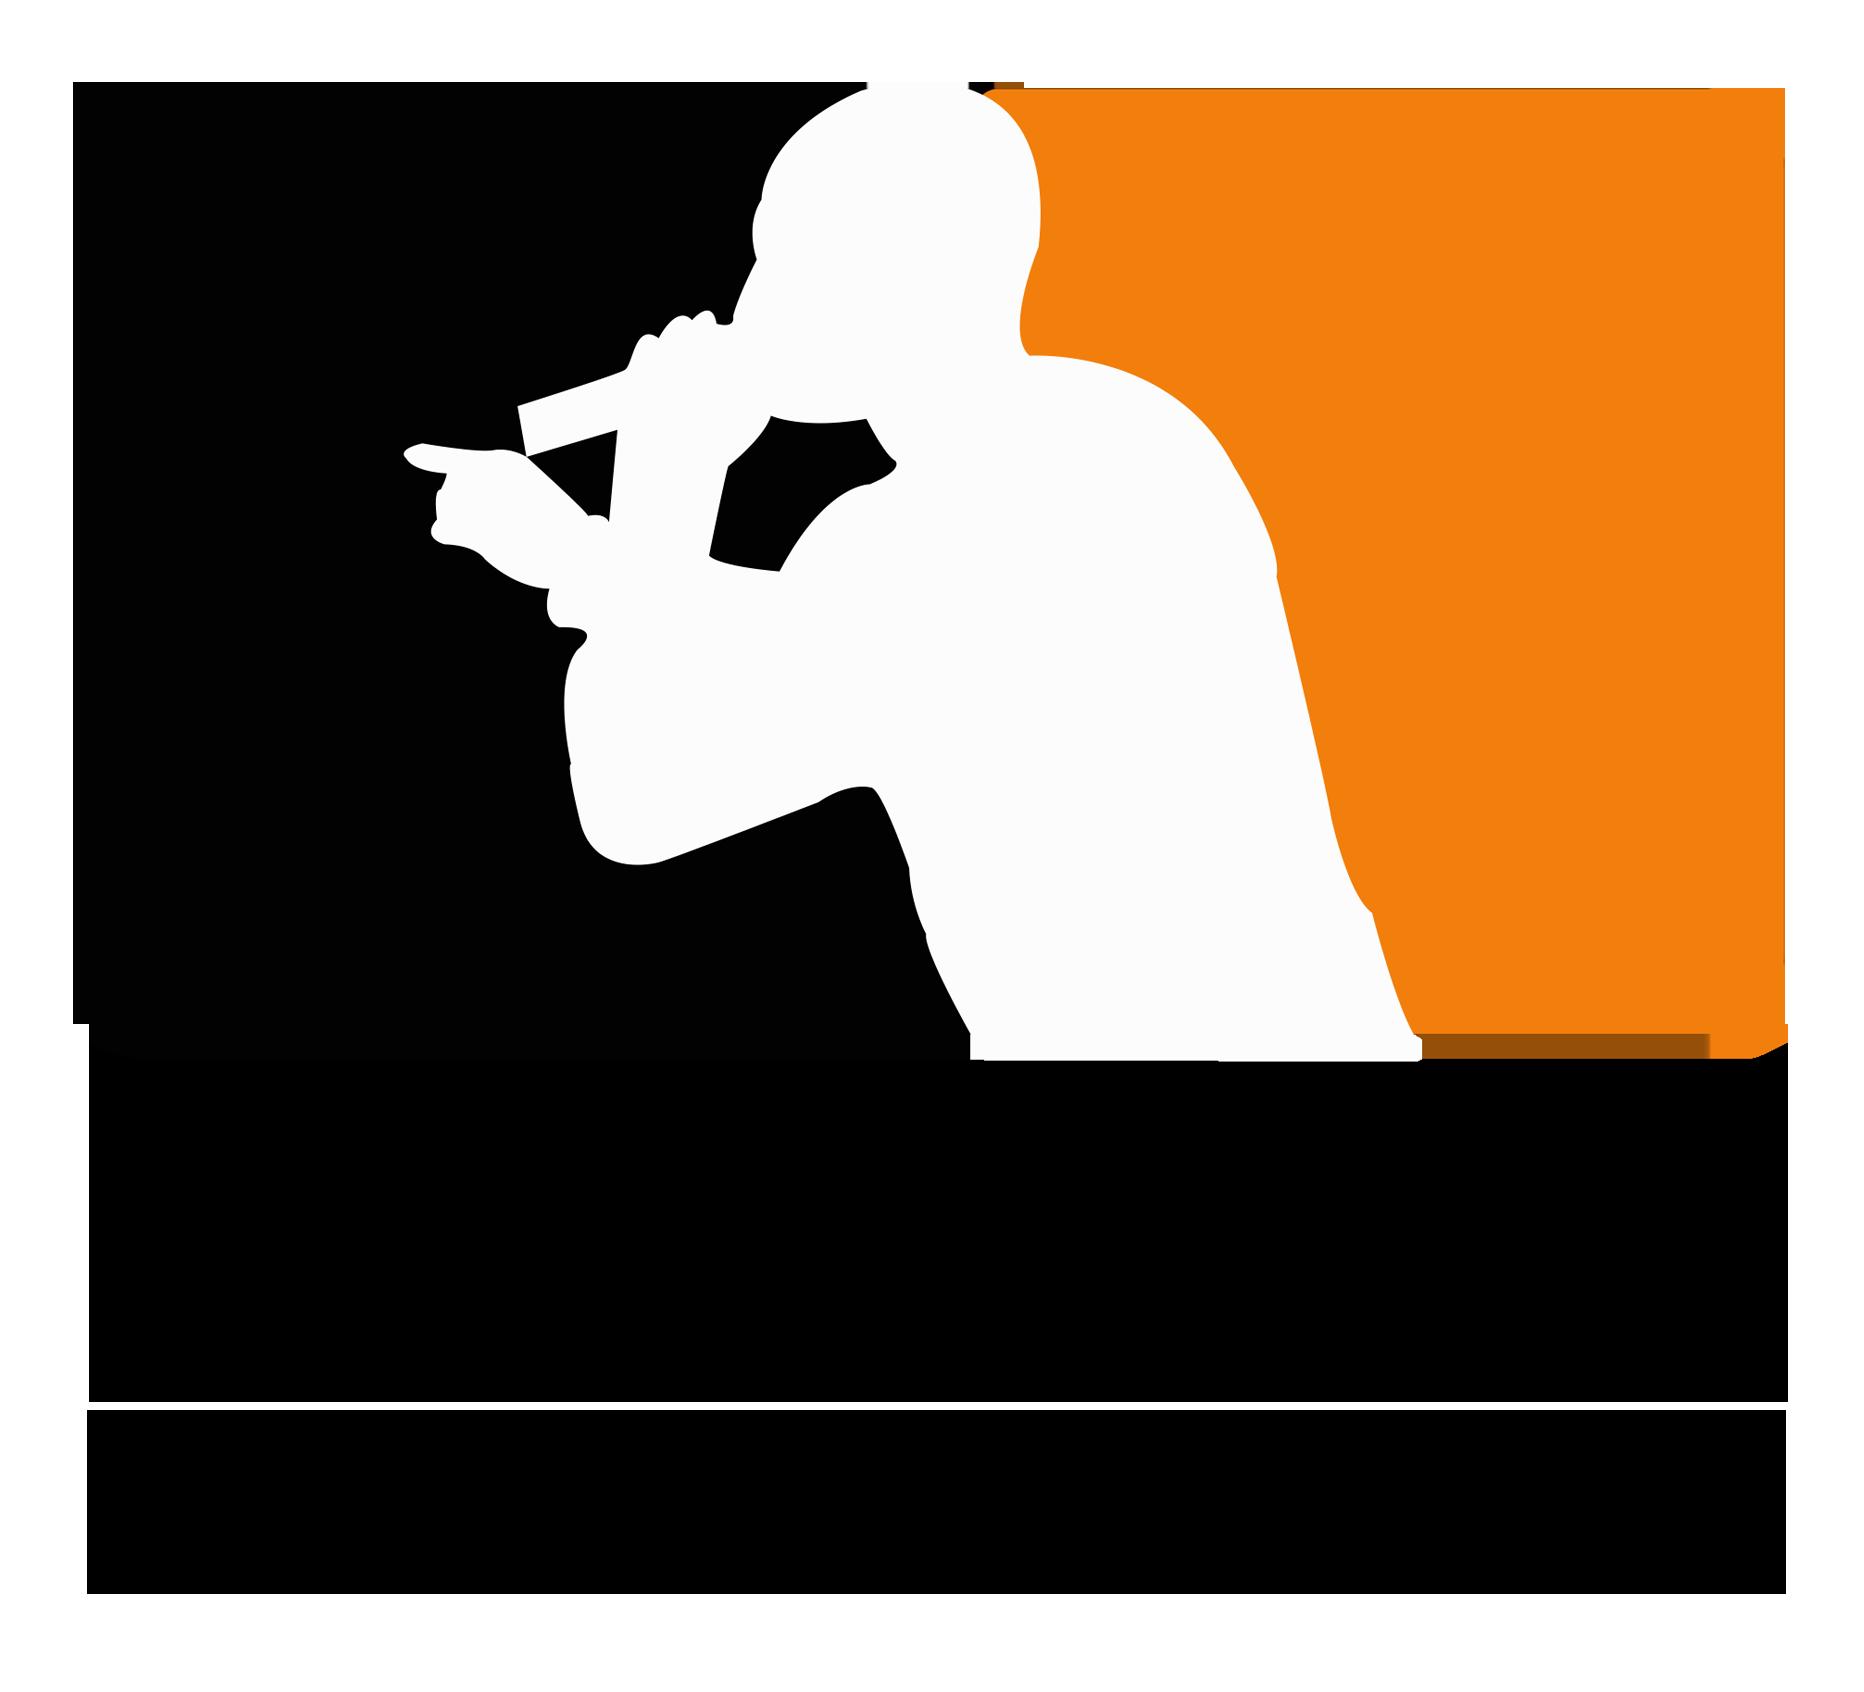 punchligue_logo-1426889026.png